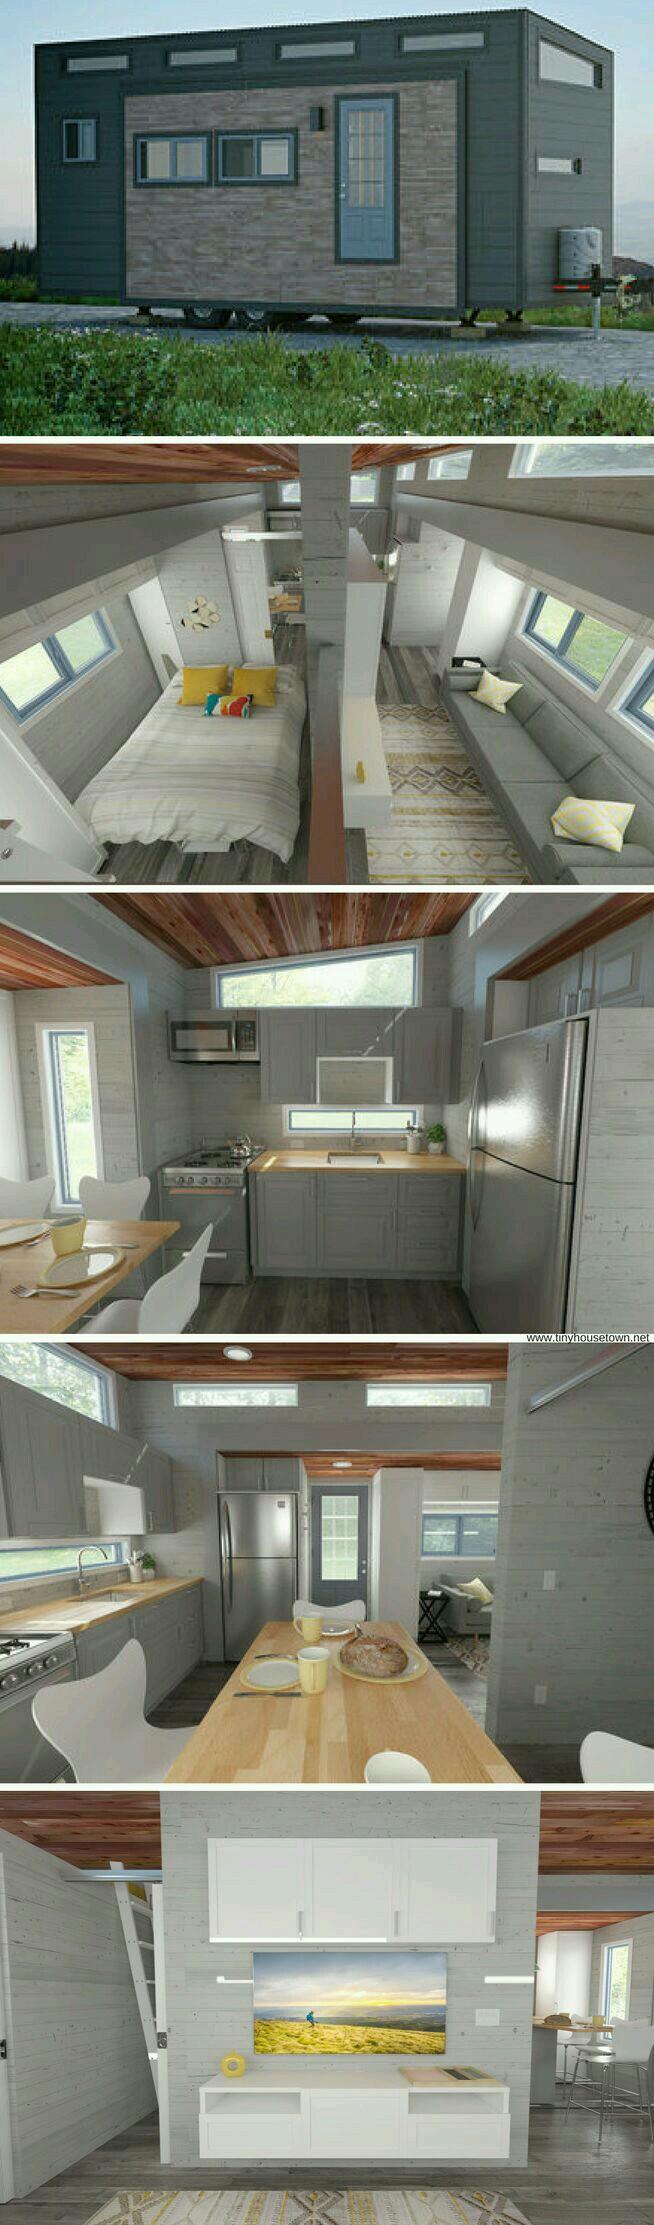 Zero Squared Calgary Dream House In 2019 Tiny House